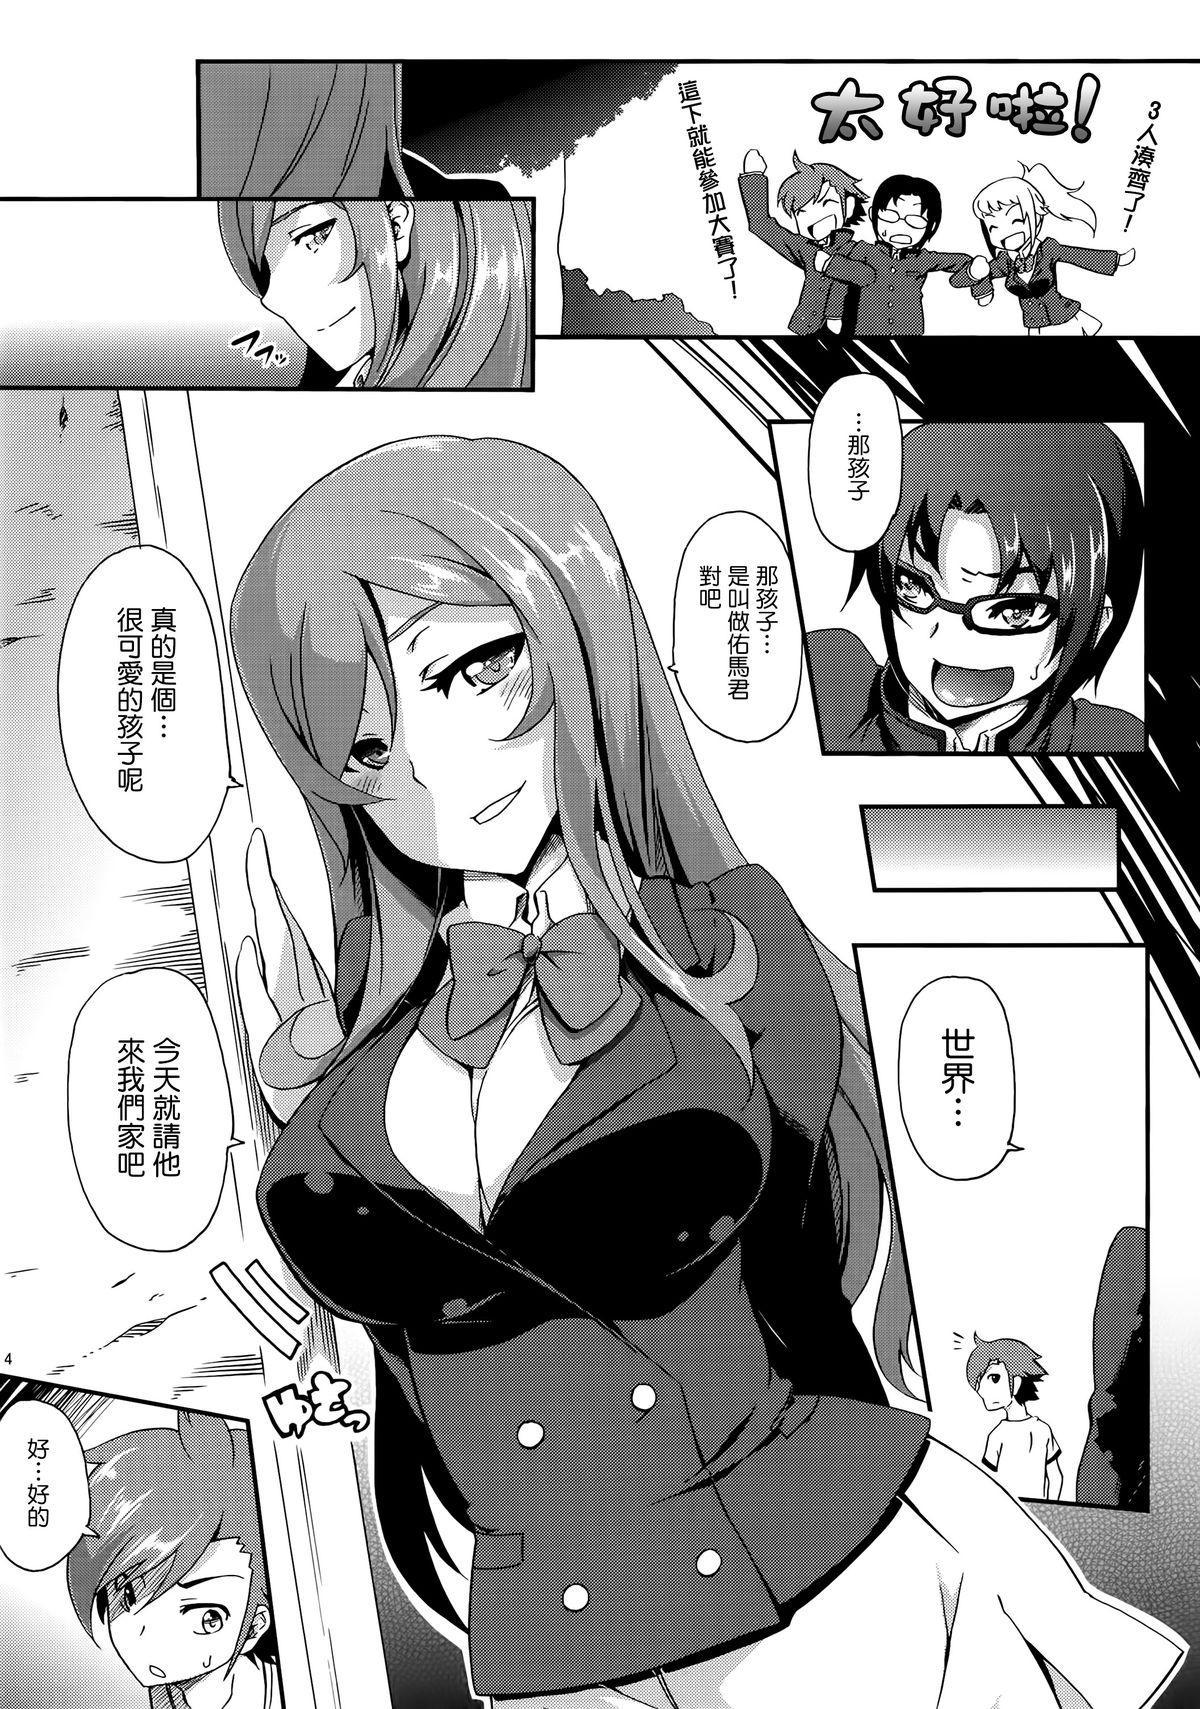 Mirai no Onegai 3